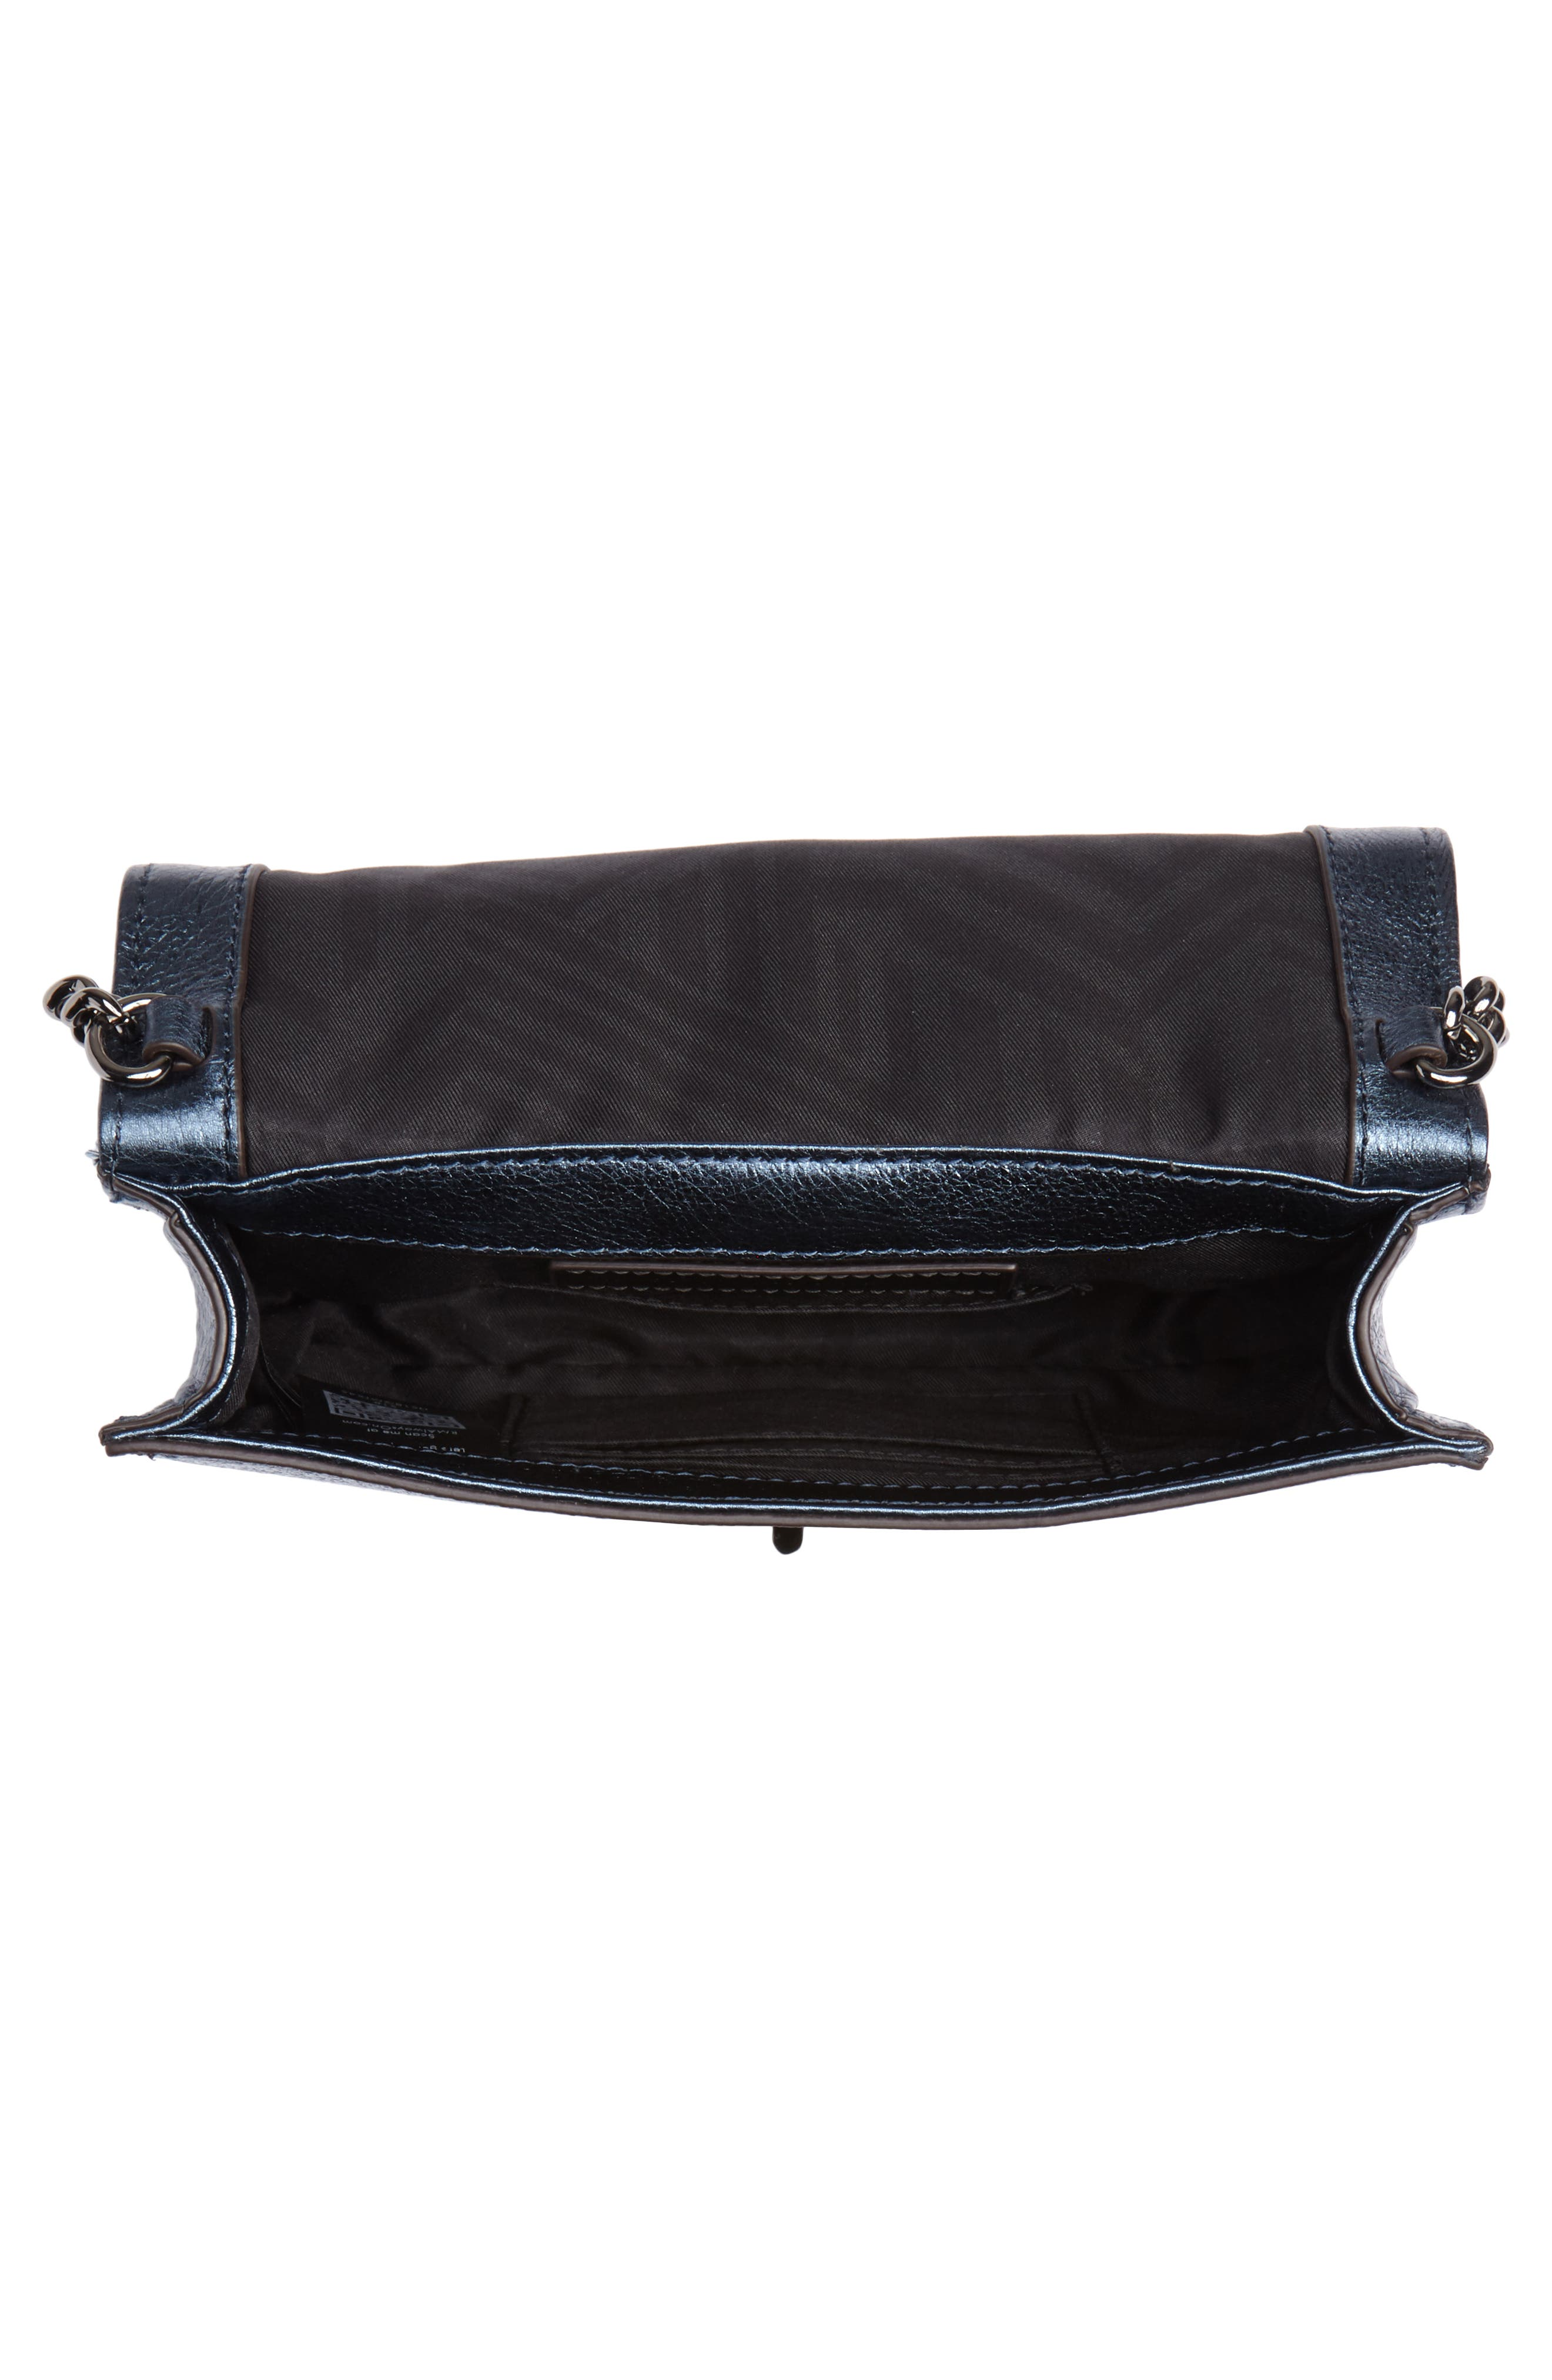 Small Love Metallic Leather Crossbody Bag,                             Alternate thumbnail 11, color,